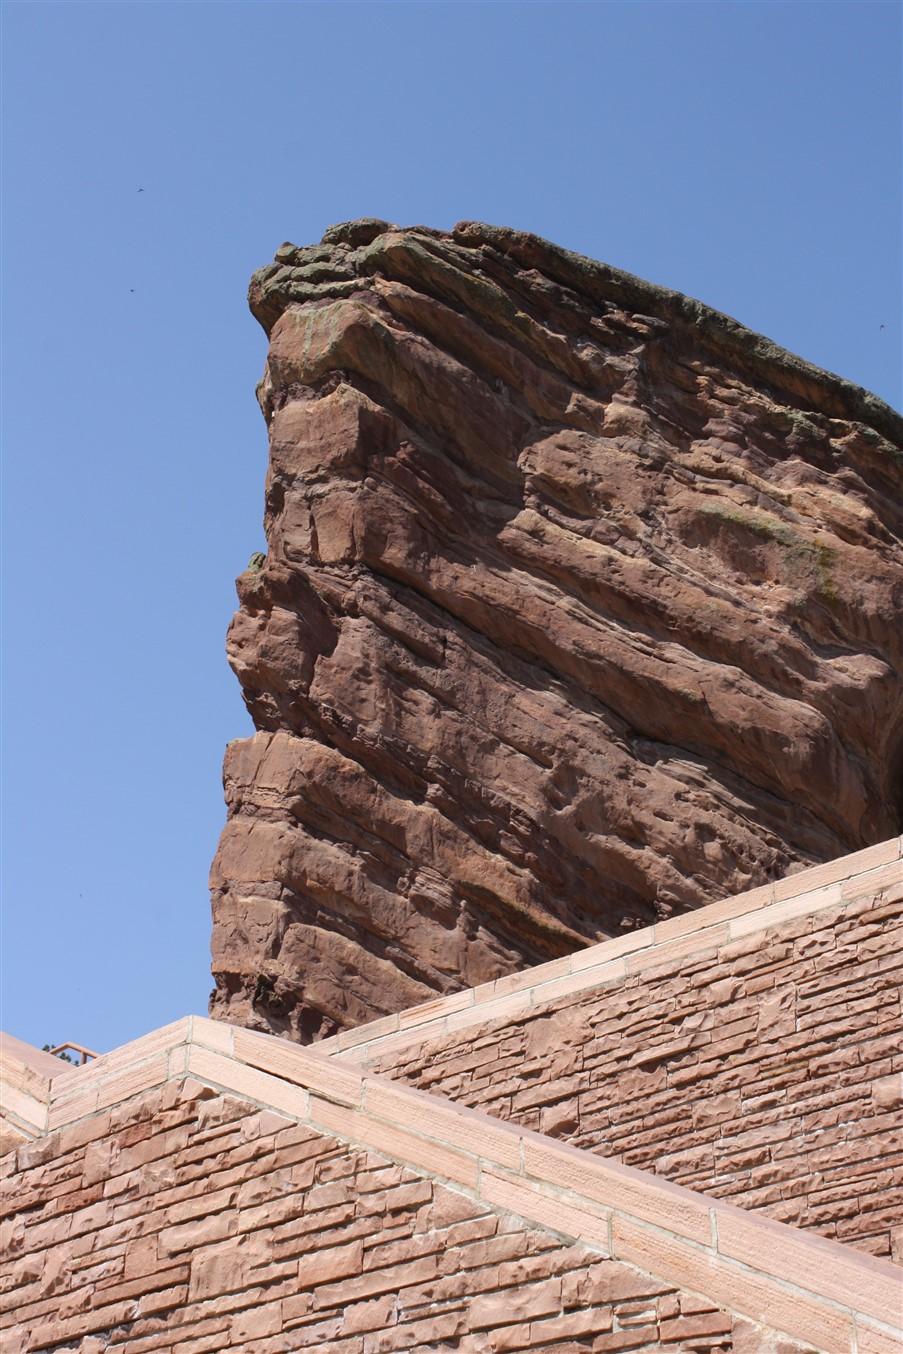 2010 05 20 Colorado 82 Clear Red Rocks Park.jpg